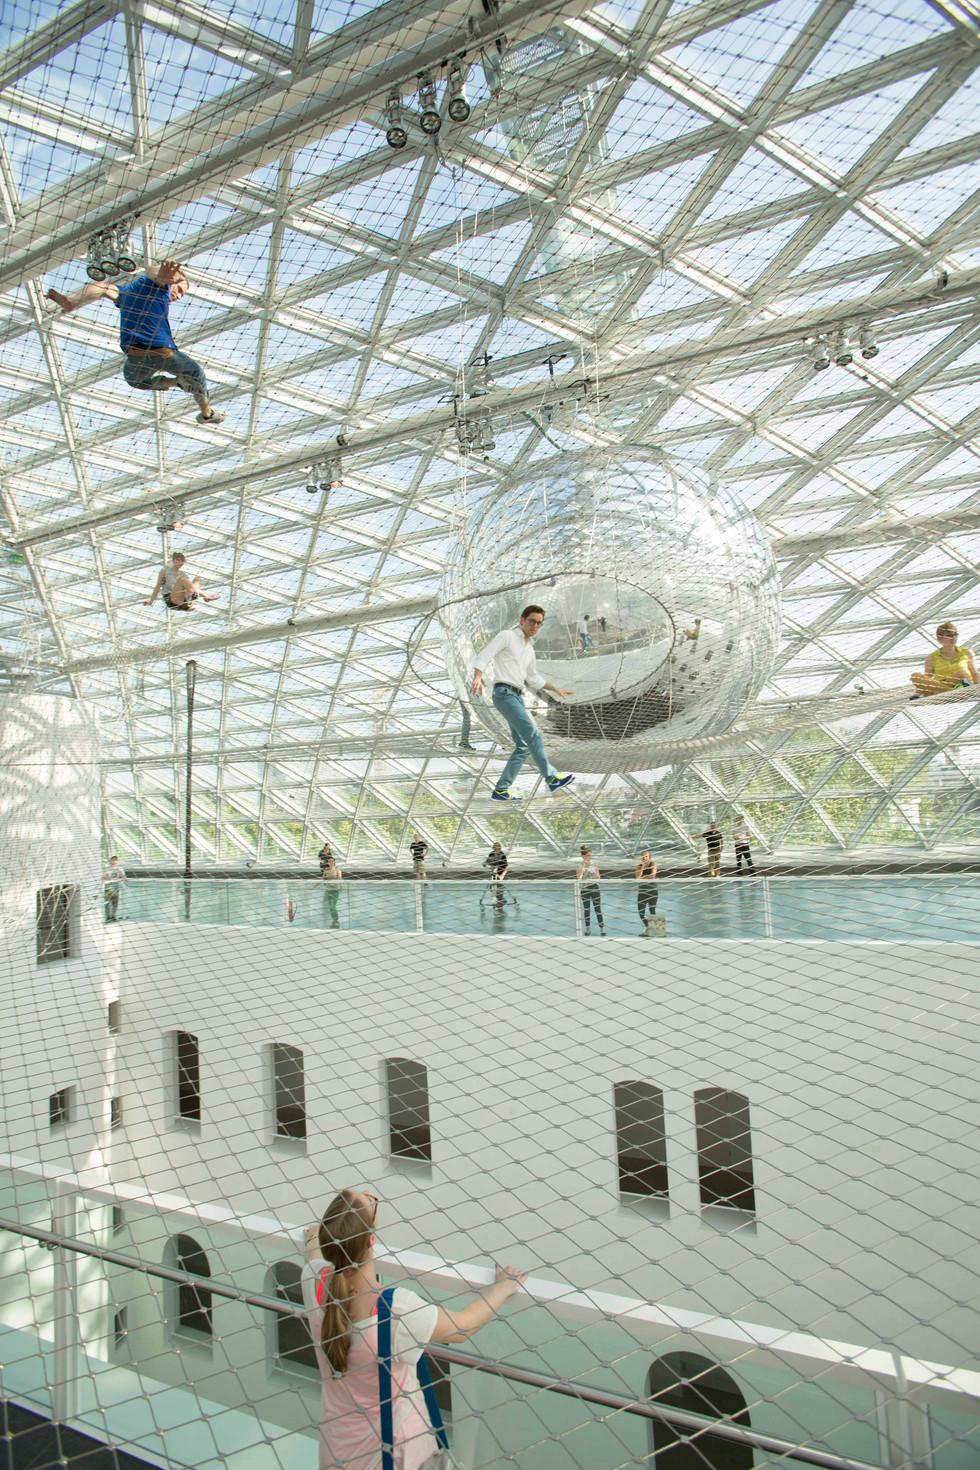 Tomás Saraceno im Orbit, Kunstsammlung NRW K21